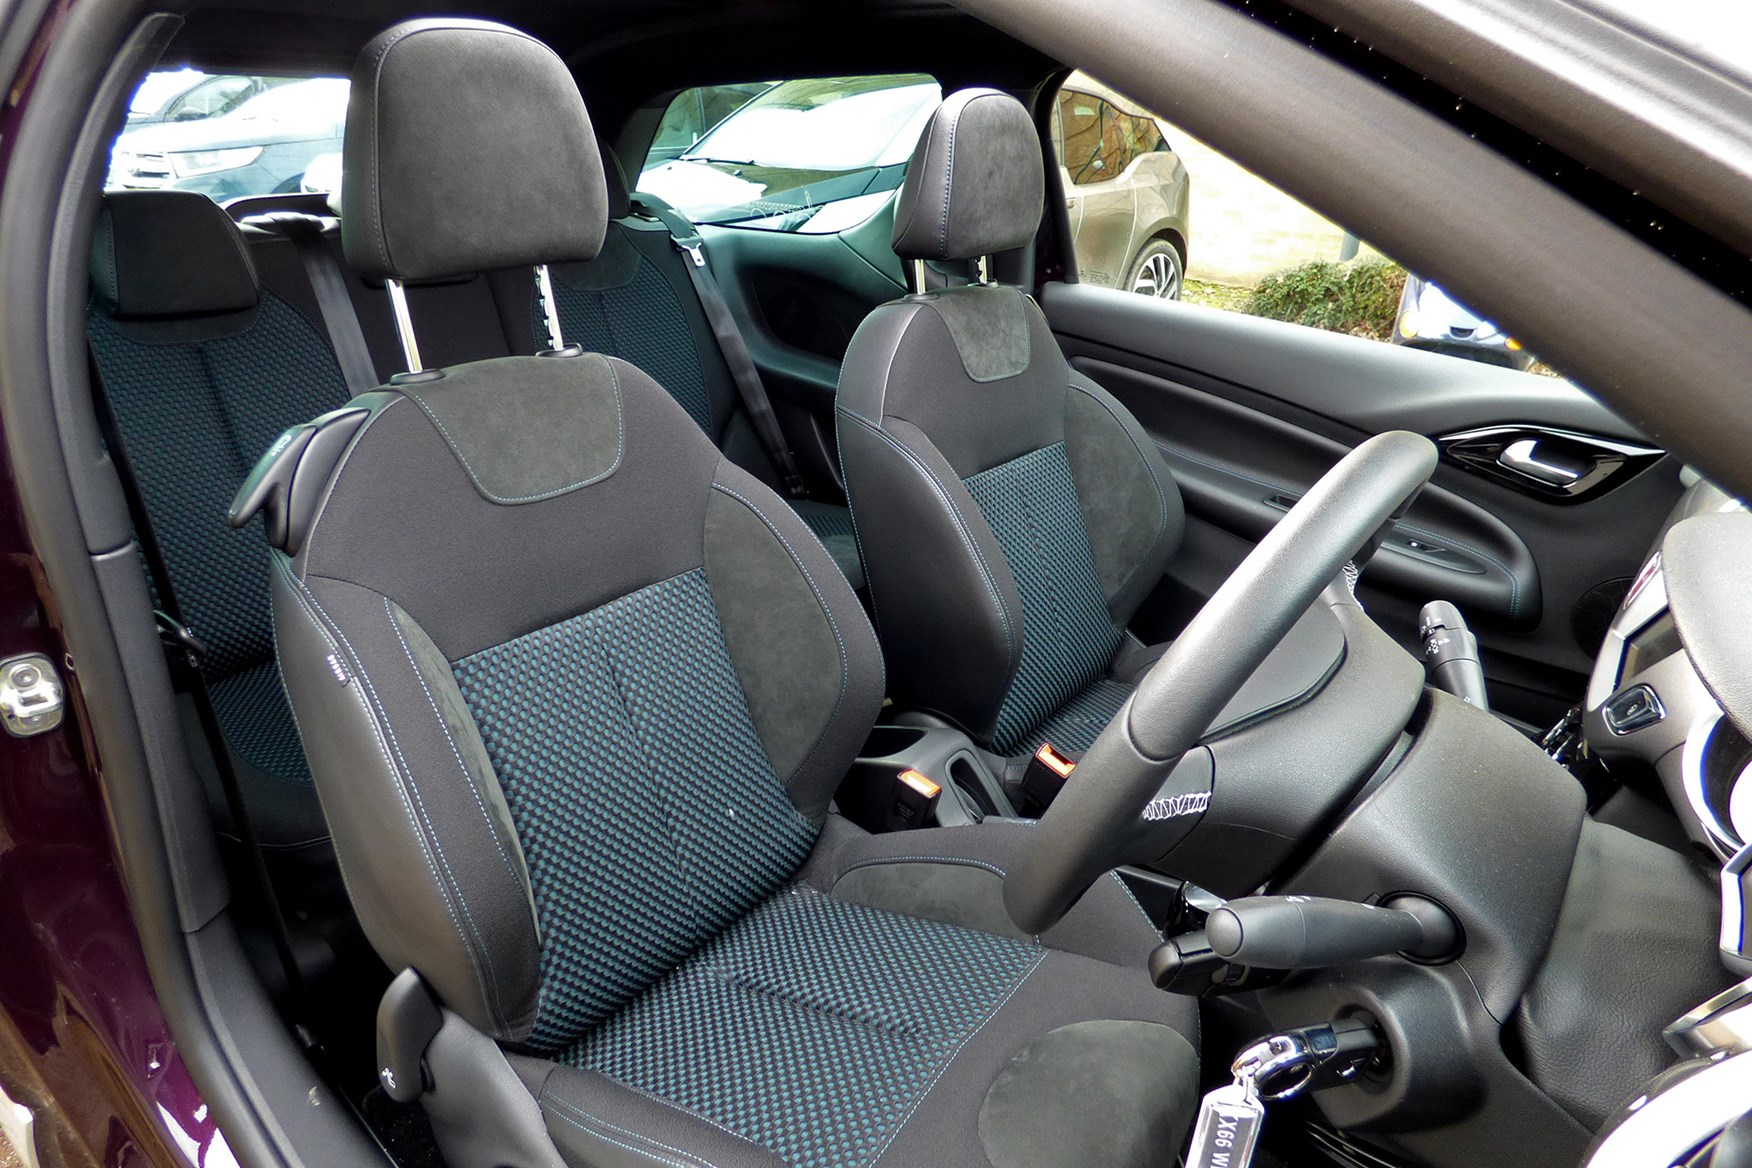 DS 3 Cabrio front seats